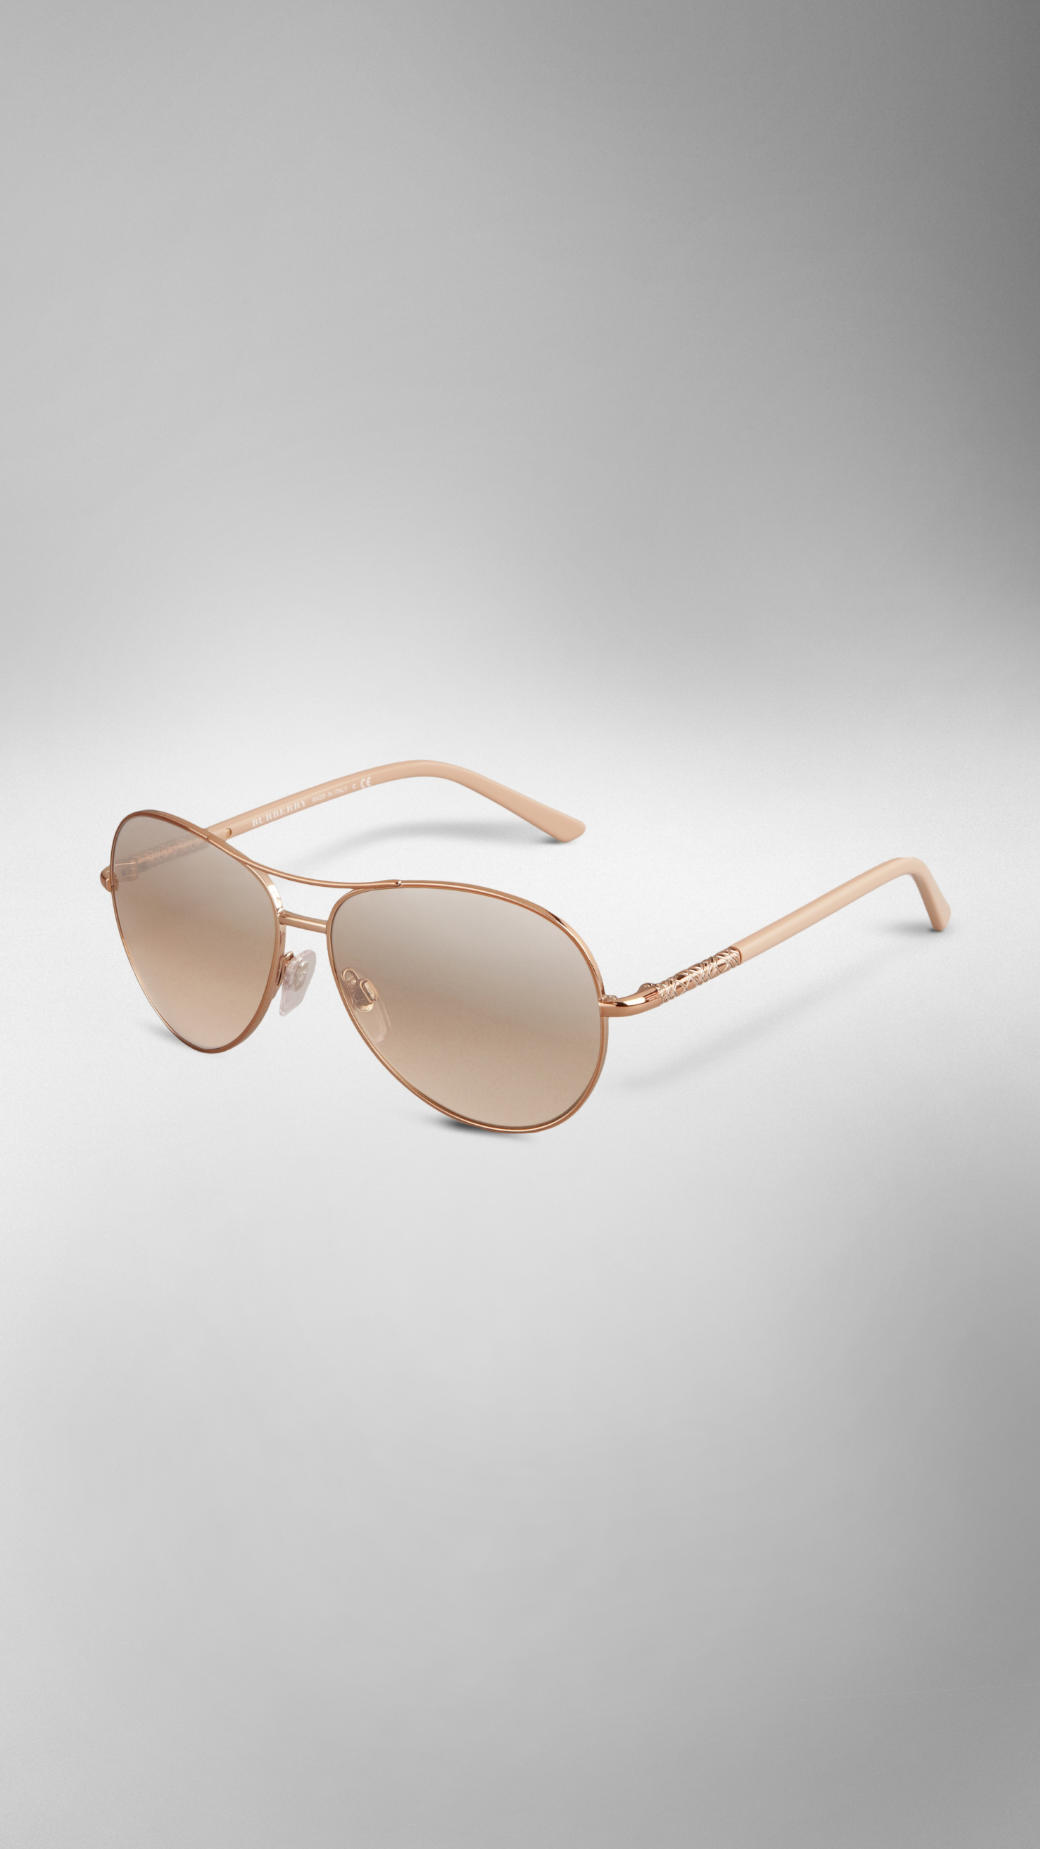 2f6f1bef559 Lyst - Burberry Nude Classic Aviator Sunglasses in Pink